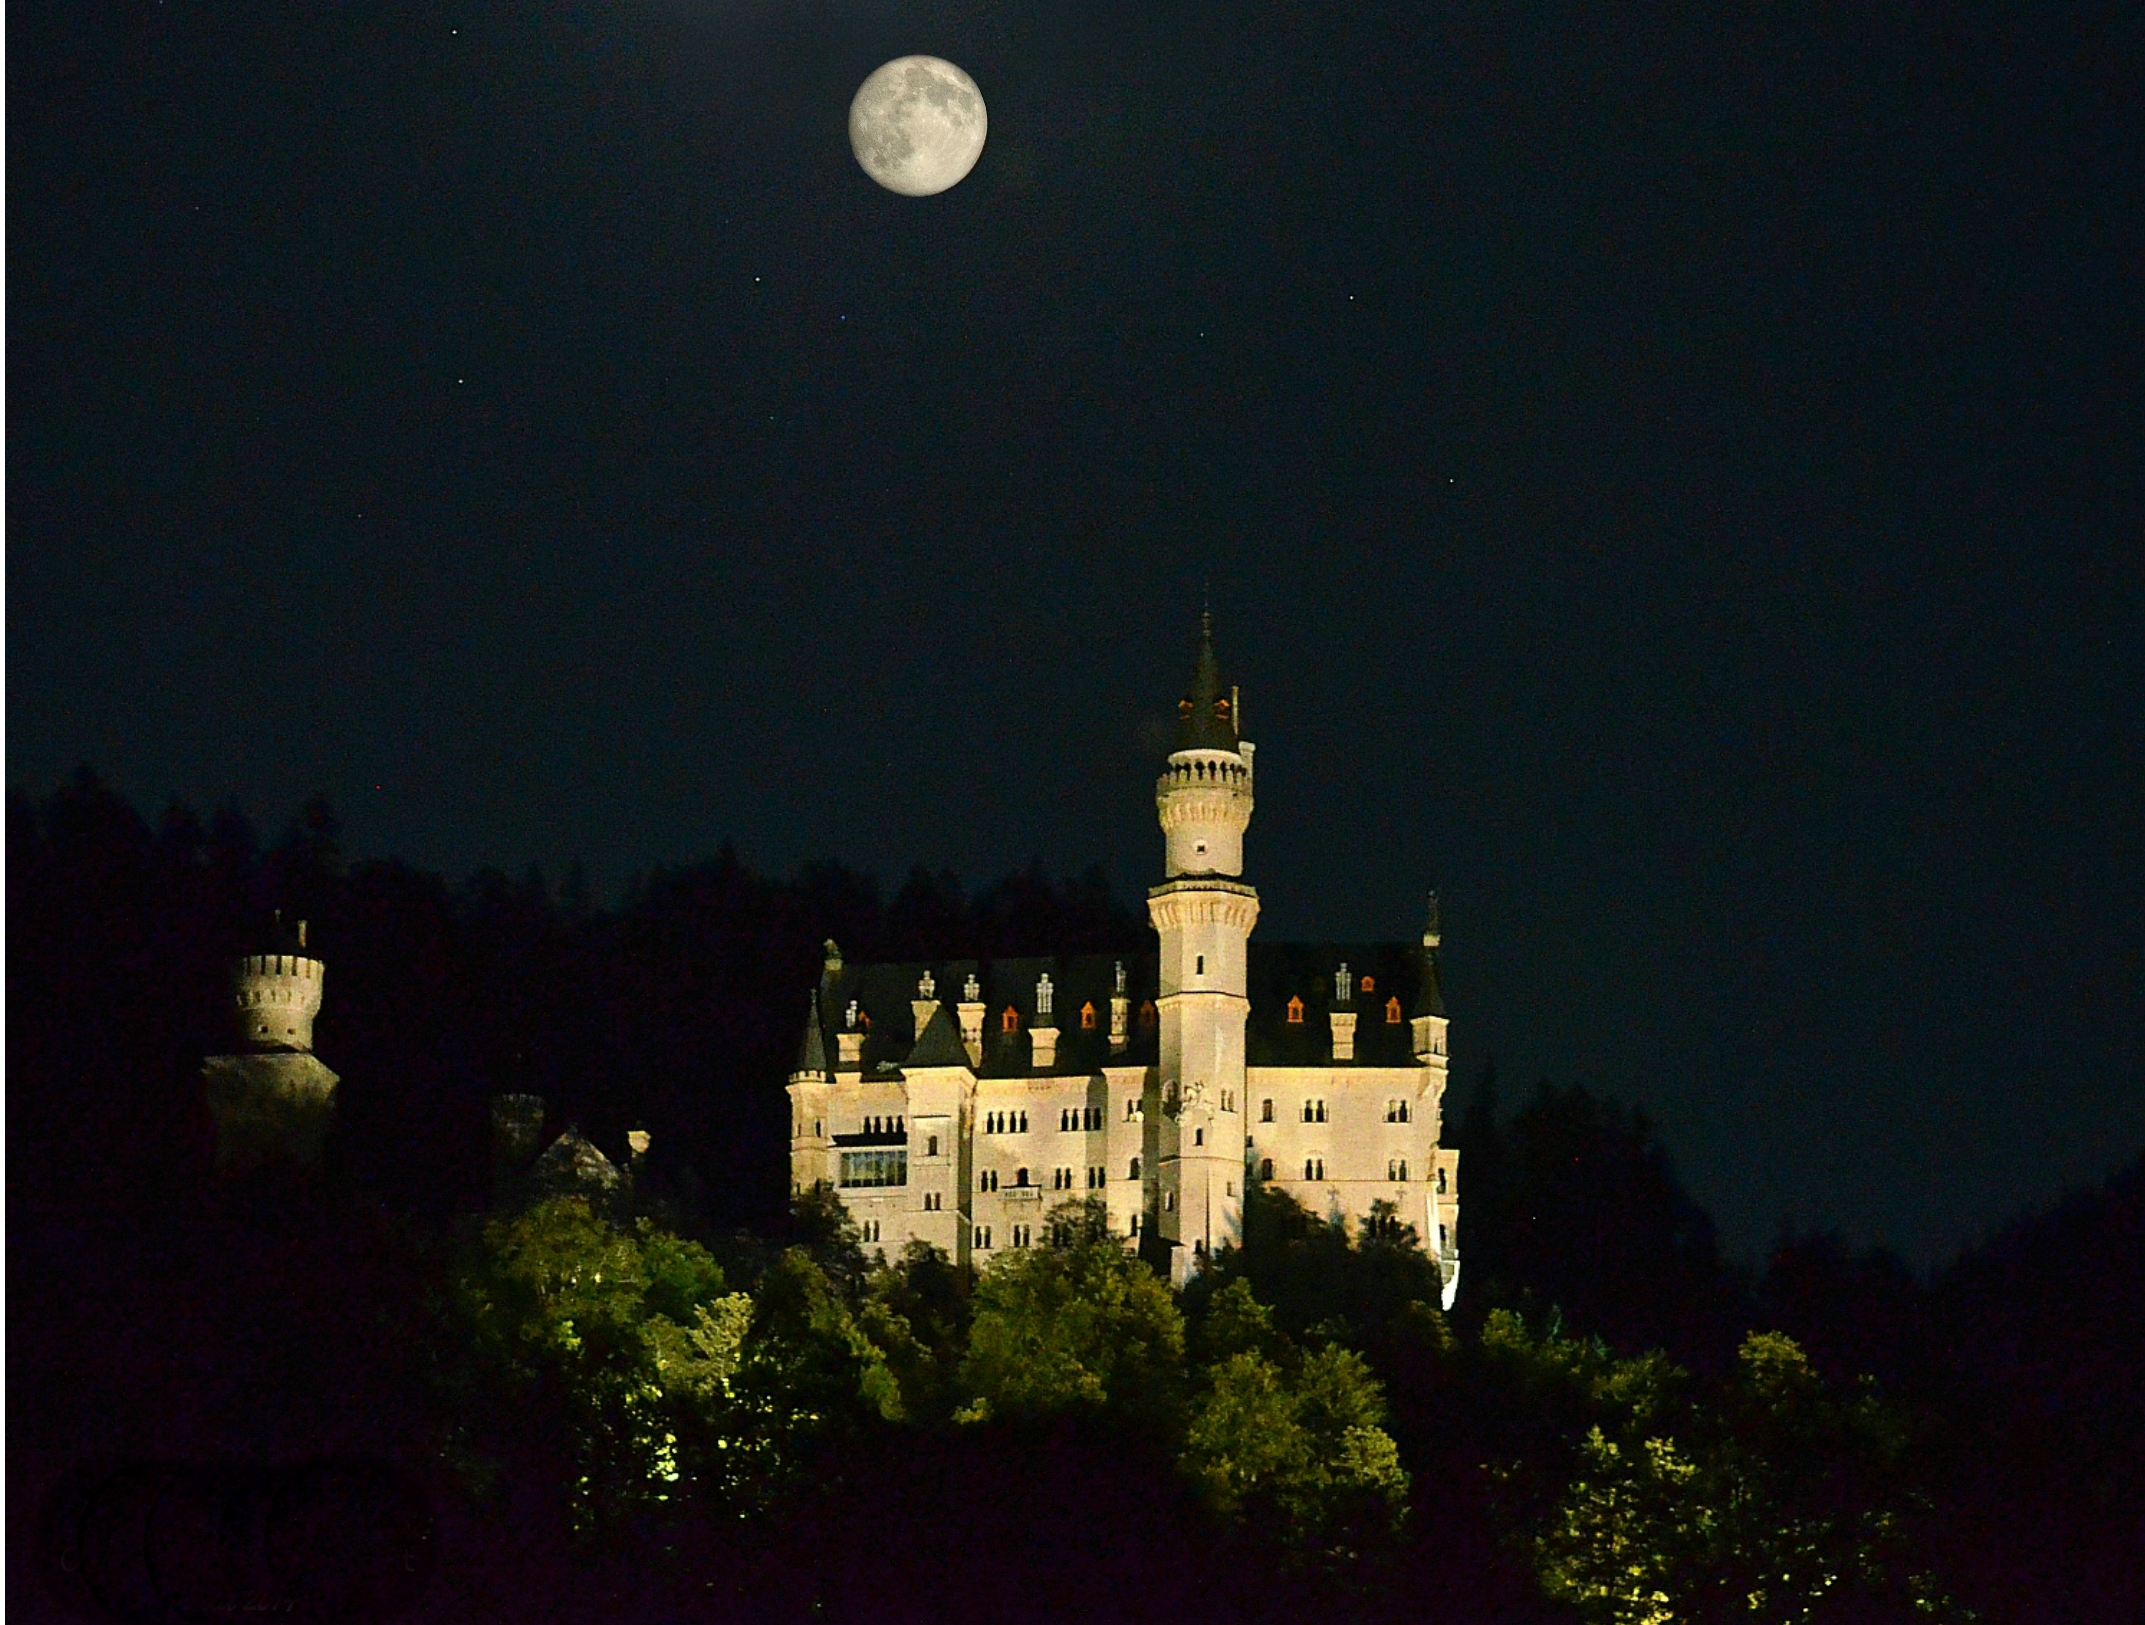 B0030 Vollmond SchlossNeuschwanstein